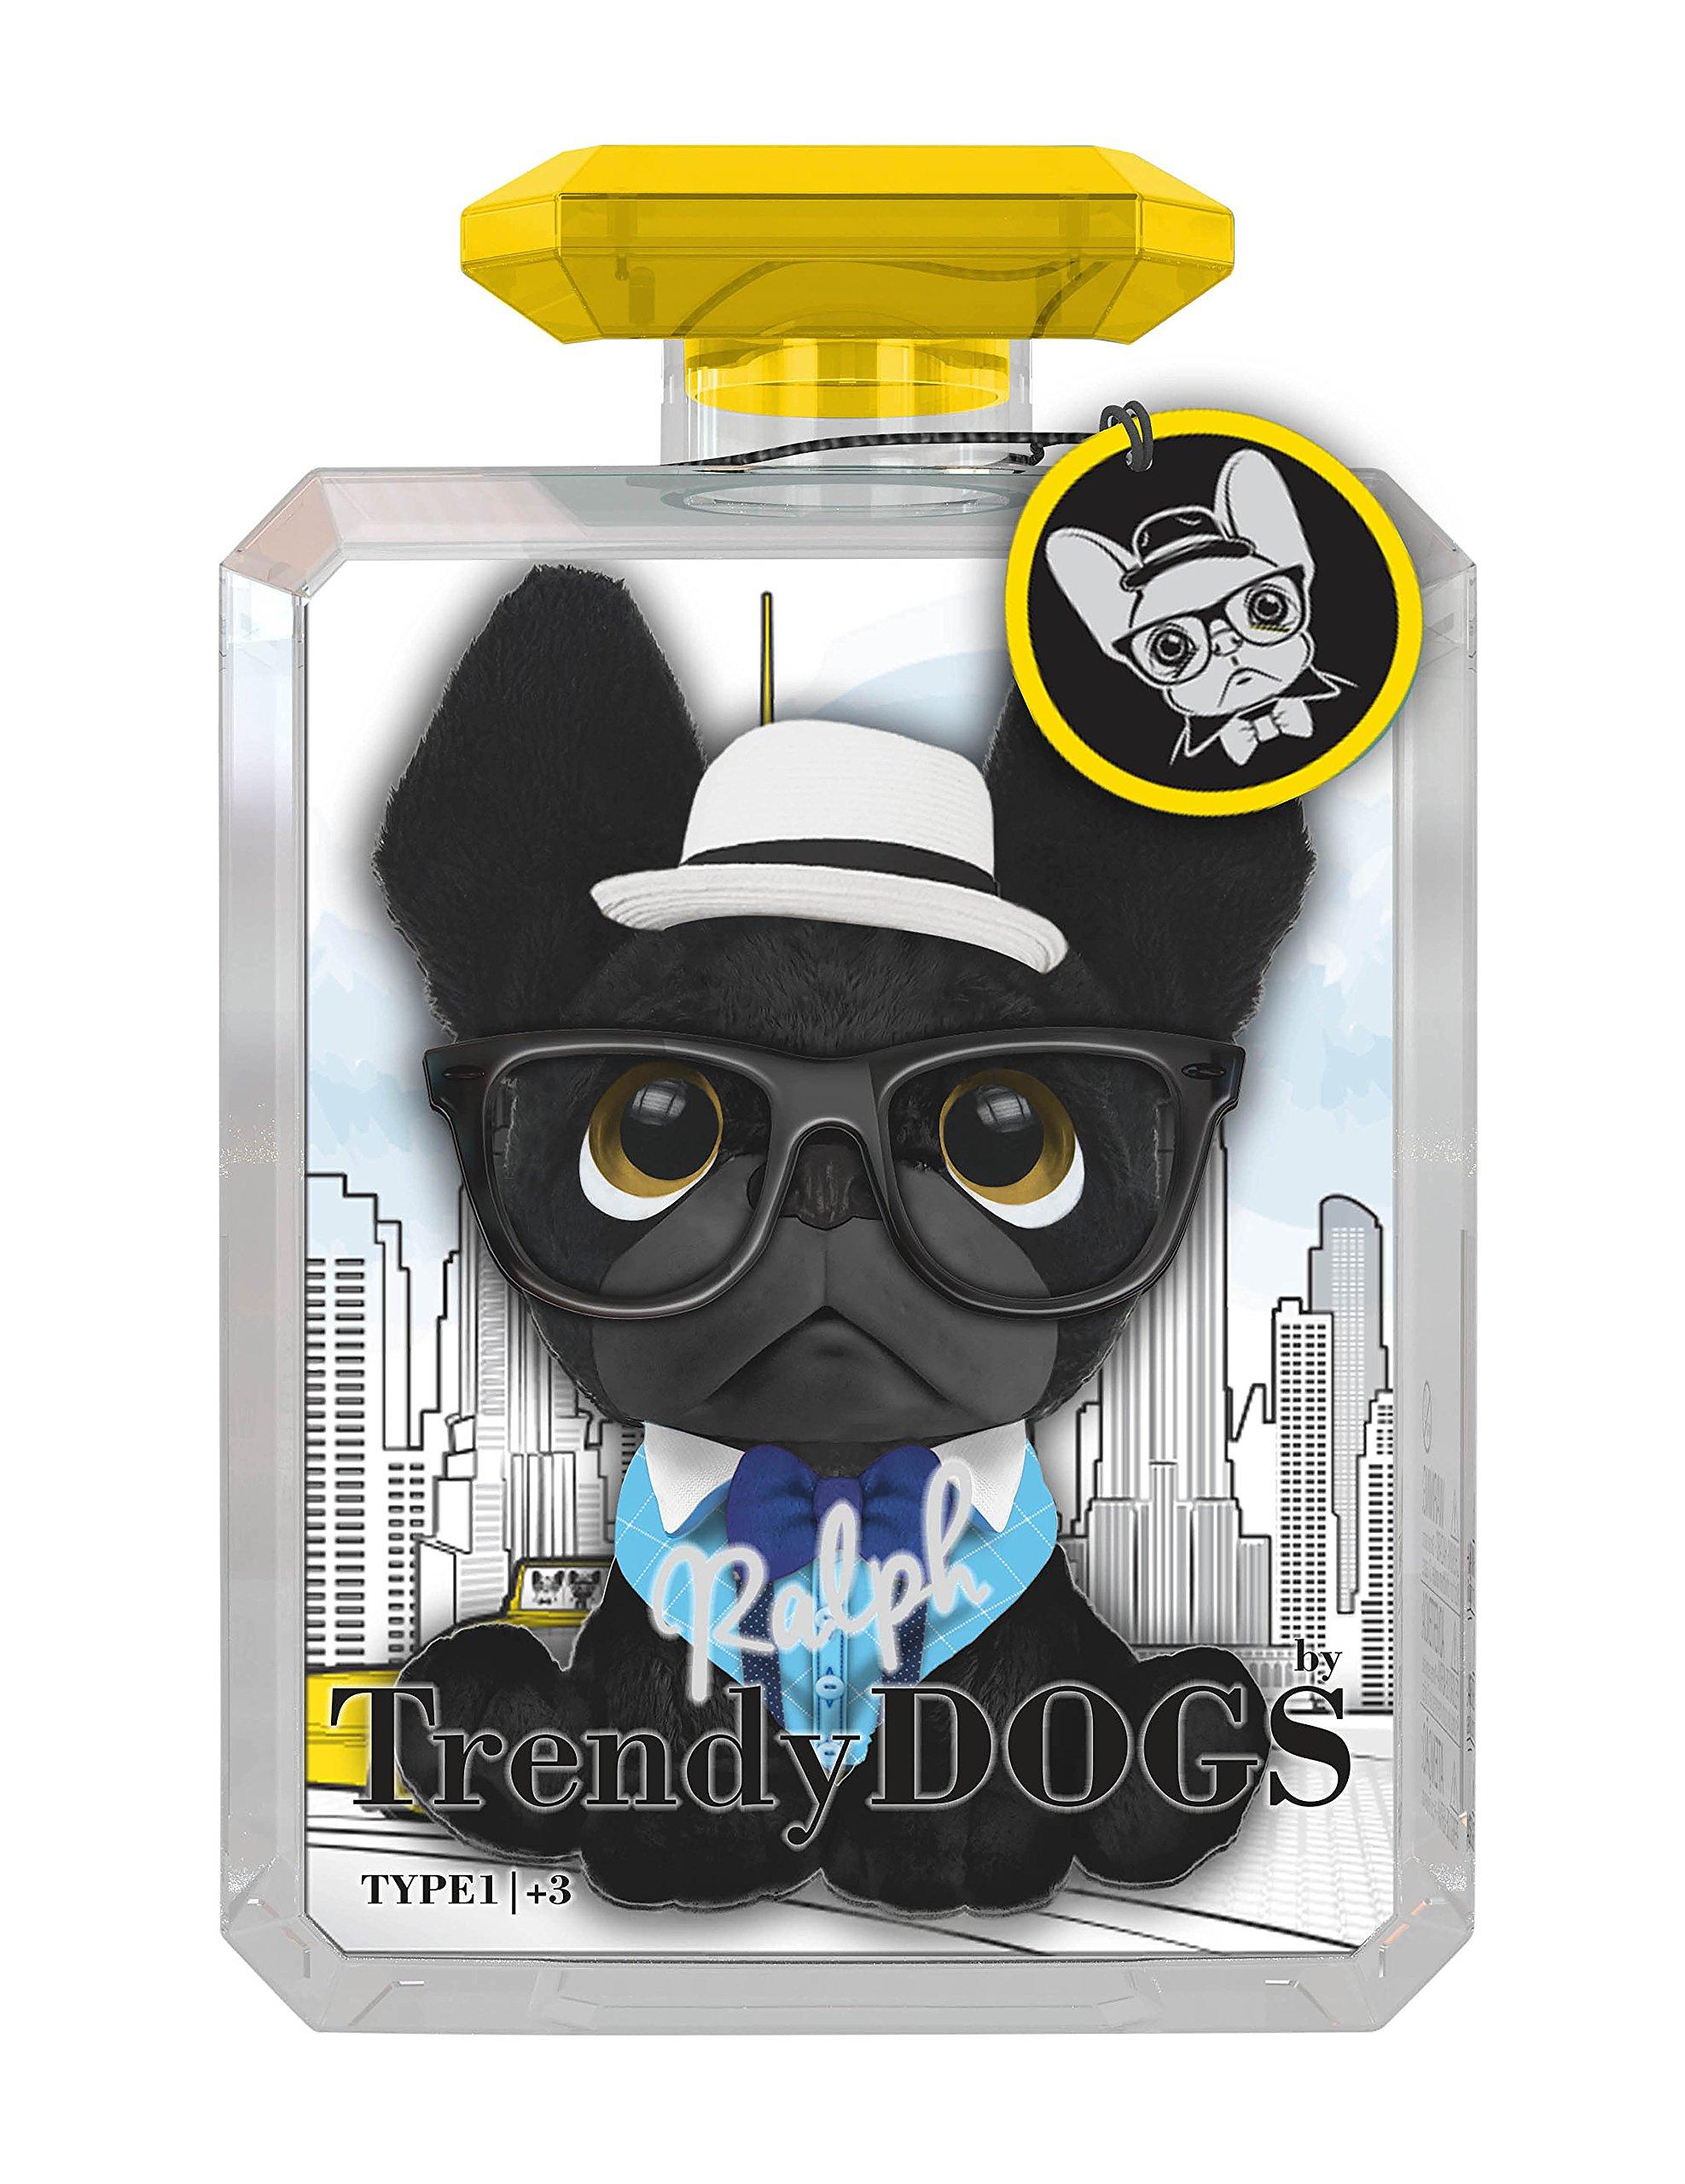 Intek Toys Trendy Dogs - Ralph - 8'' - Stuffed Toy